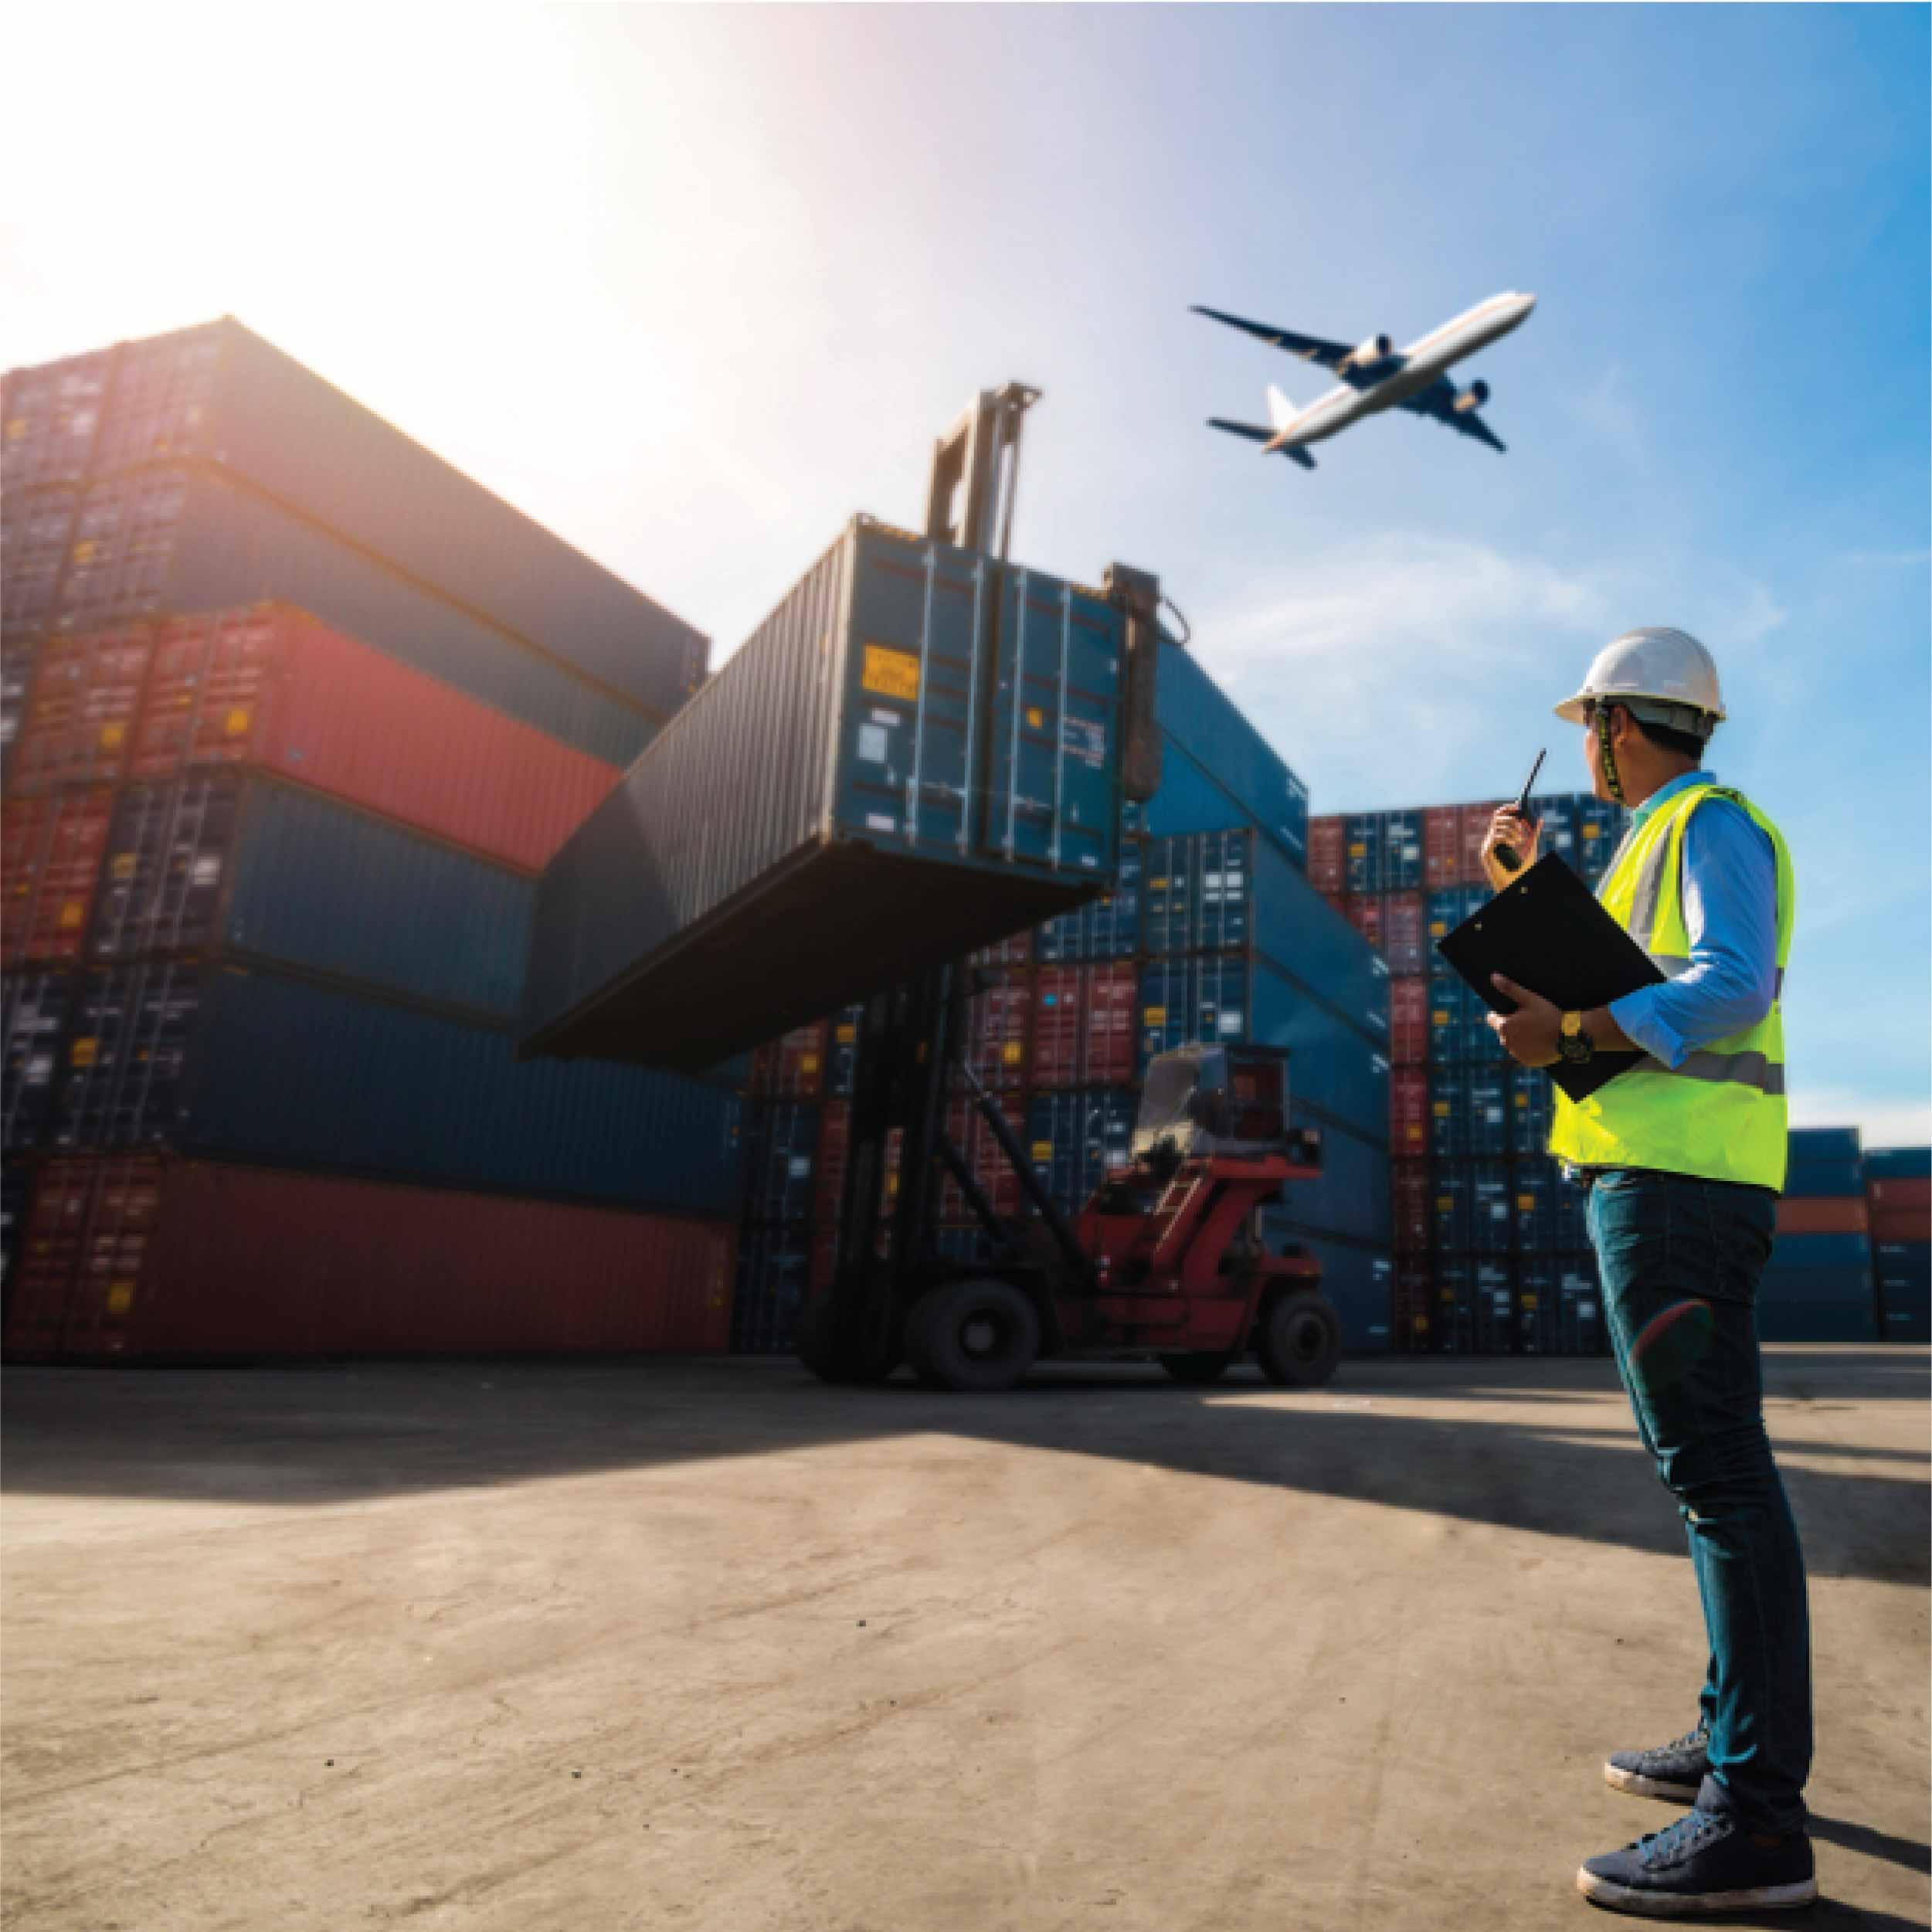 Tata Kelola Supply Chain Management demi Kemajuan Bisnis